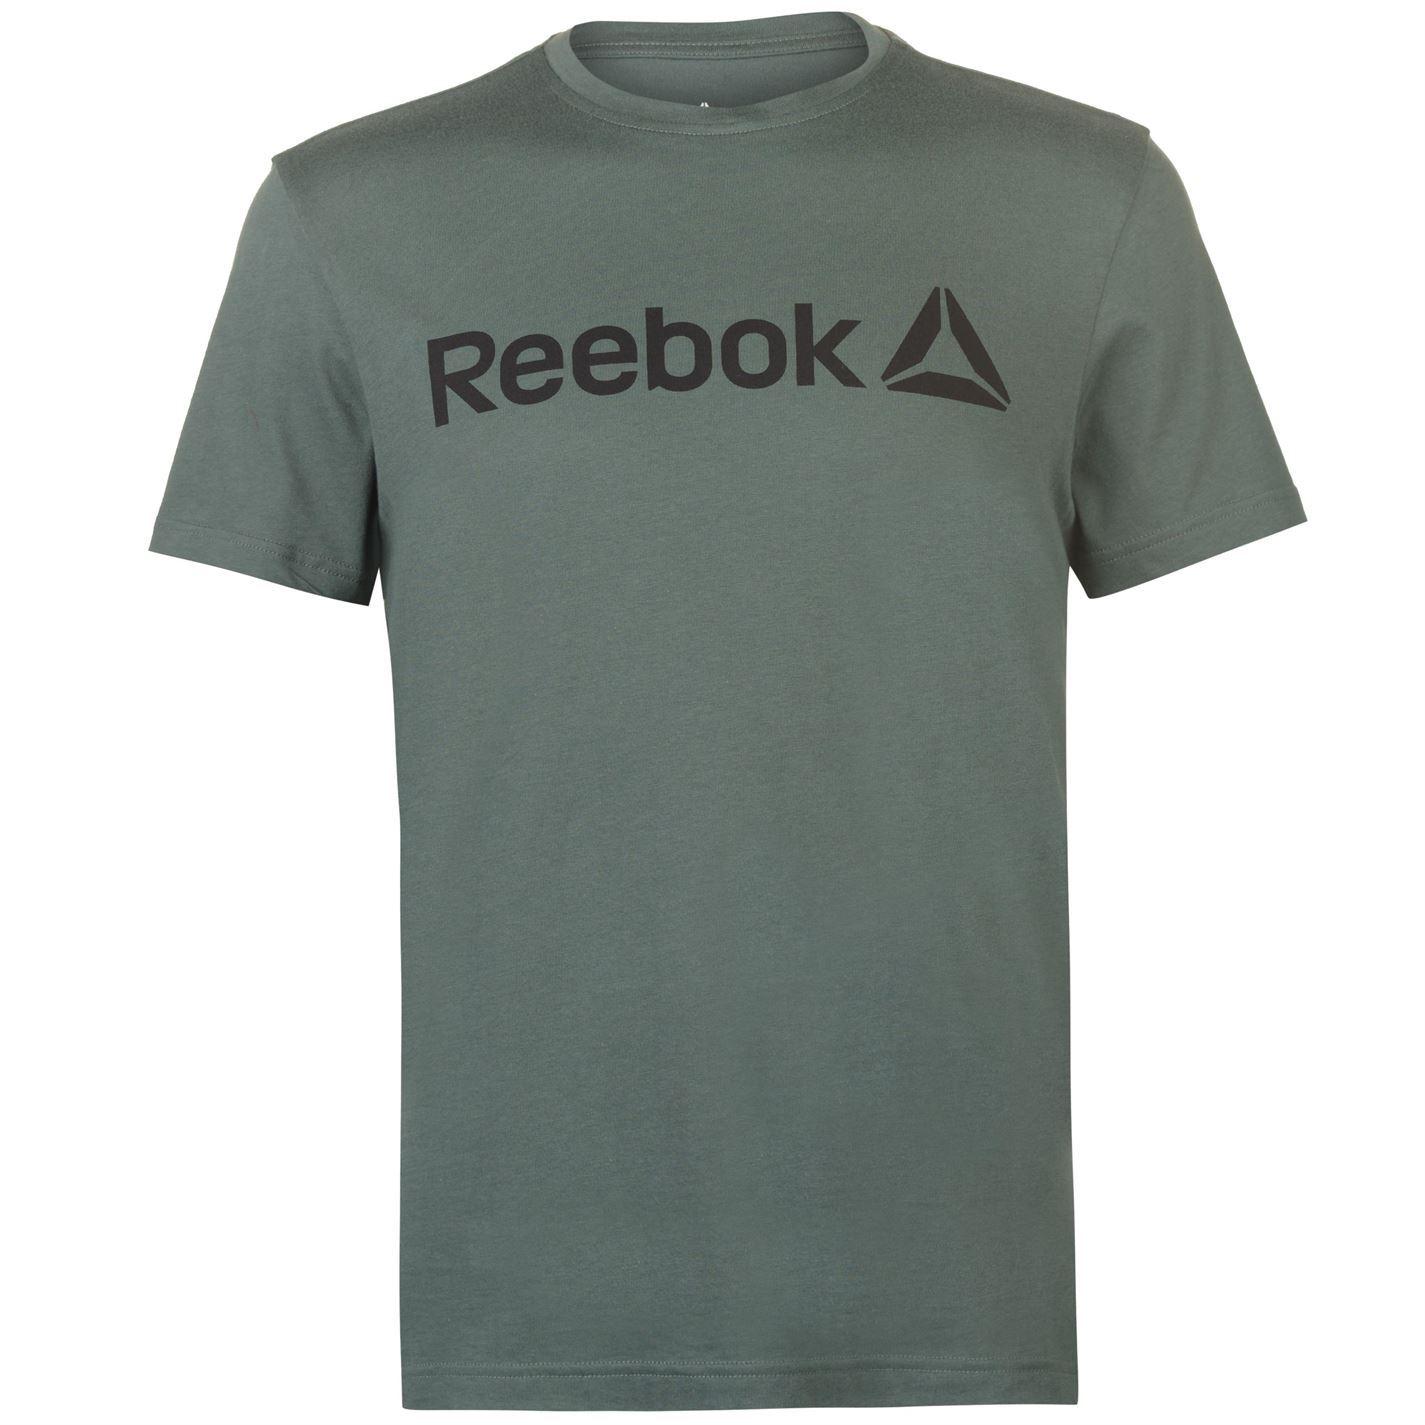 Reebok-Delta-Logo-T-Shirt-Mens-Tee-Shirt-Top thumbnail 18